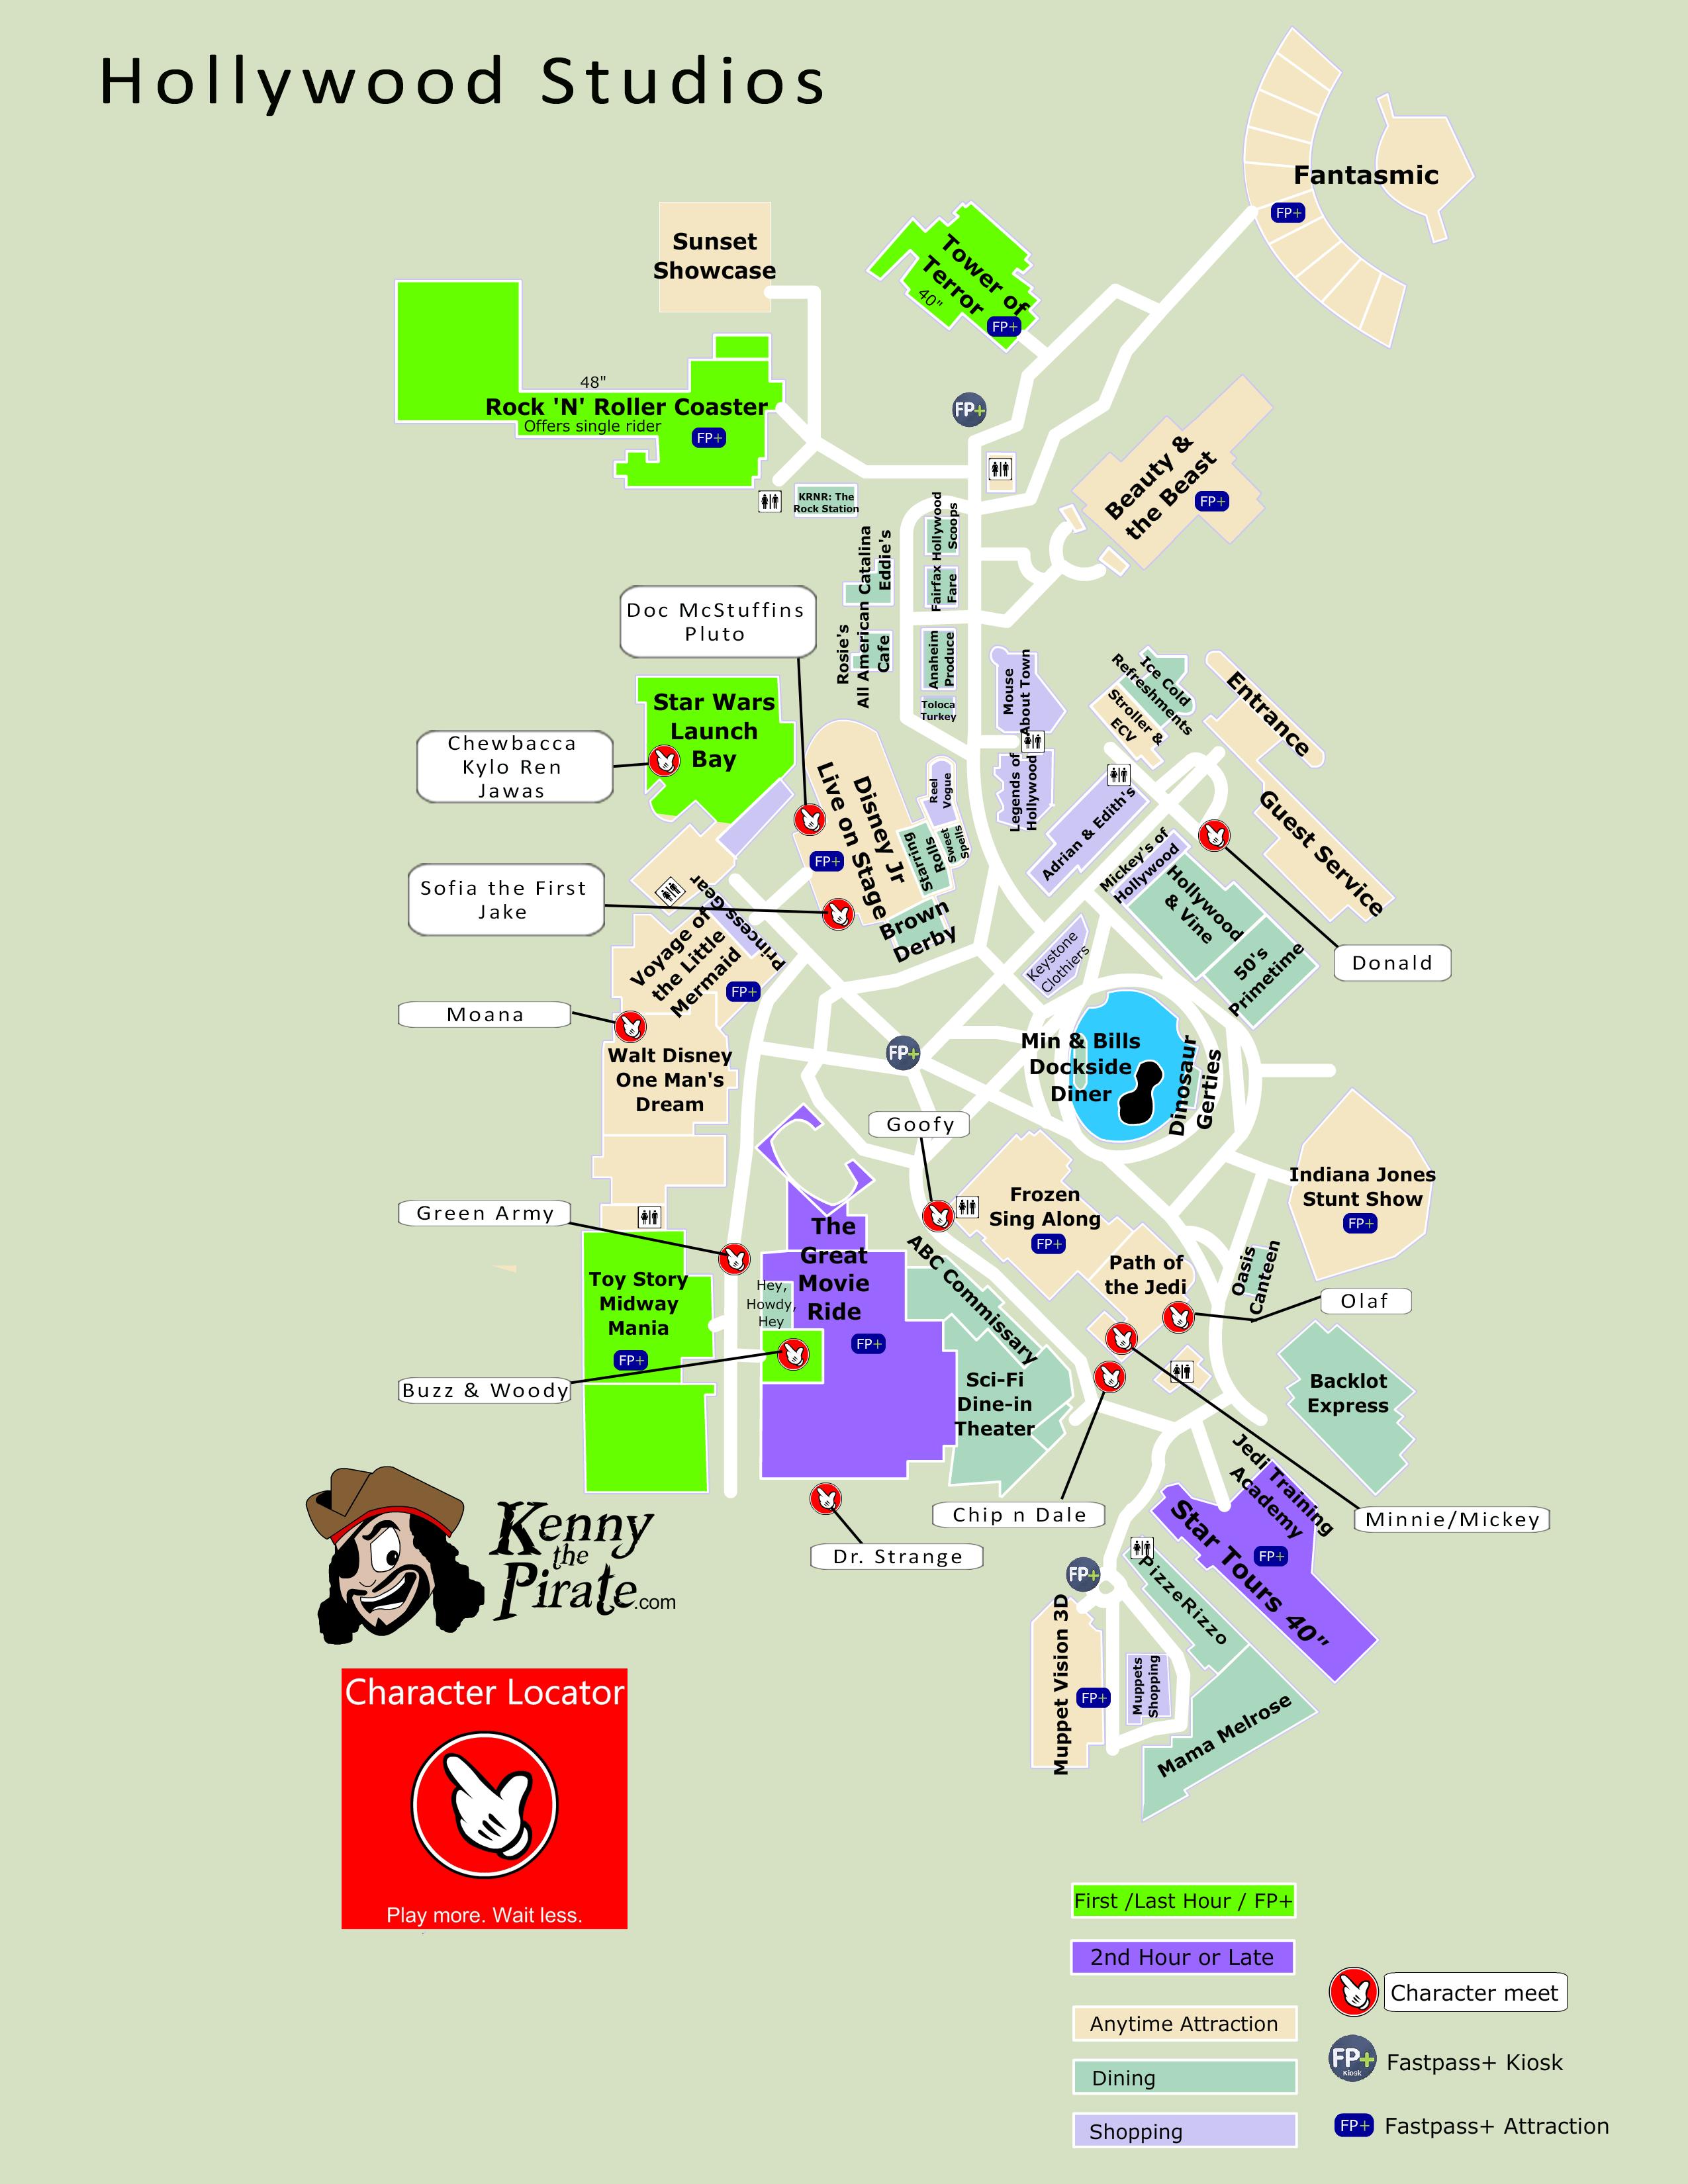 Disney World Map Hollywood Studios.Pin By Joanna White On Vacation Pinterest Hollywood Studios Map